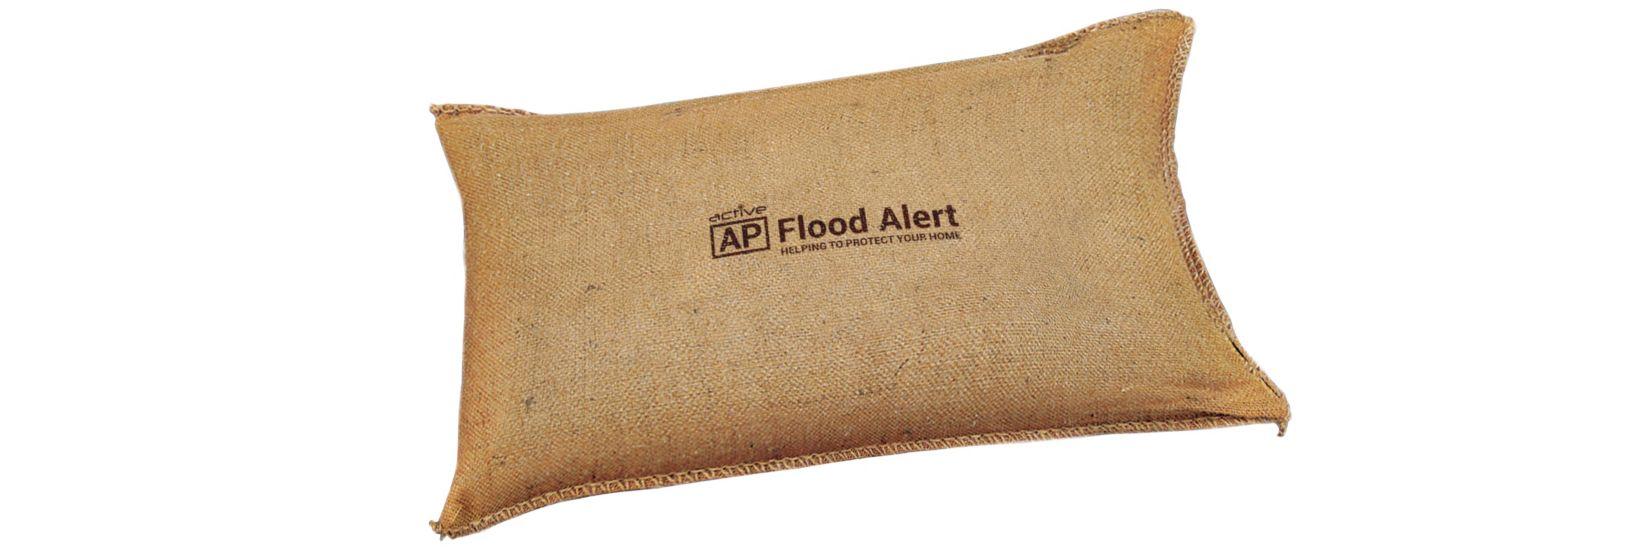 AP Hessian Expanding Flood Bag - Pack Of 5